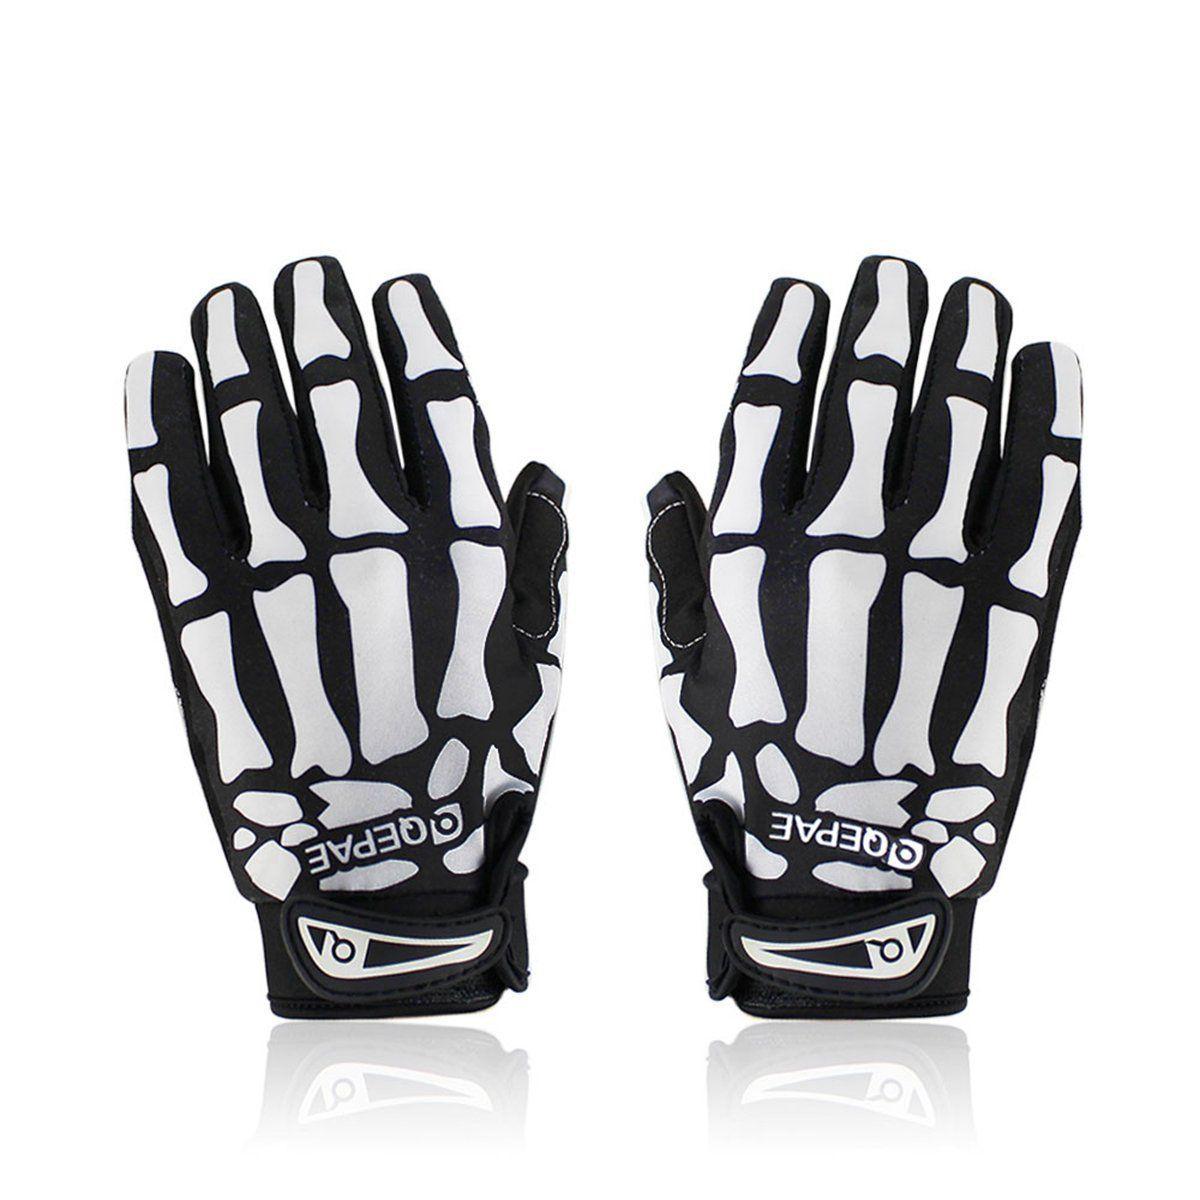 Padded Anti-slip Warm Motor Bike Bicycle Cycling Full Finger Gloves Skull